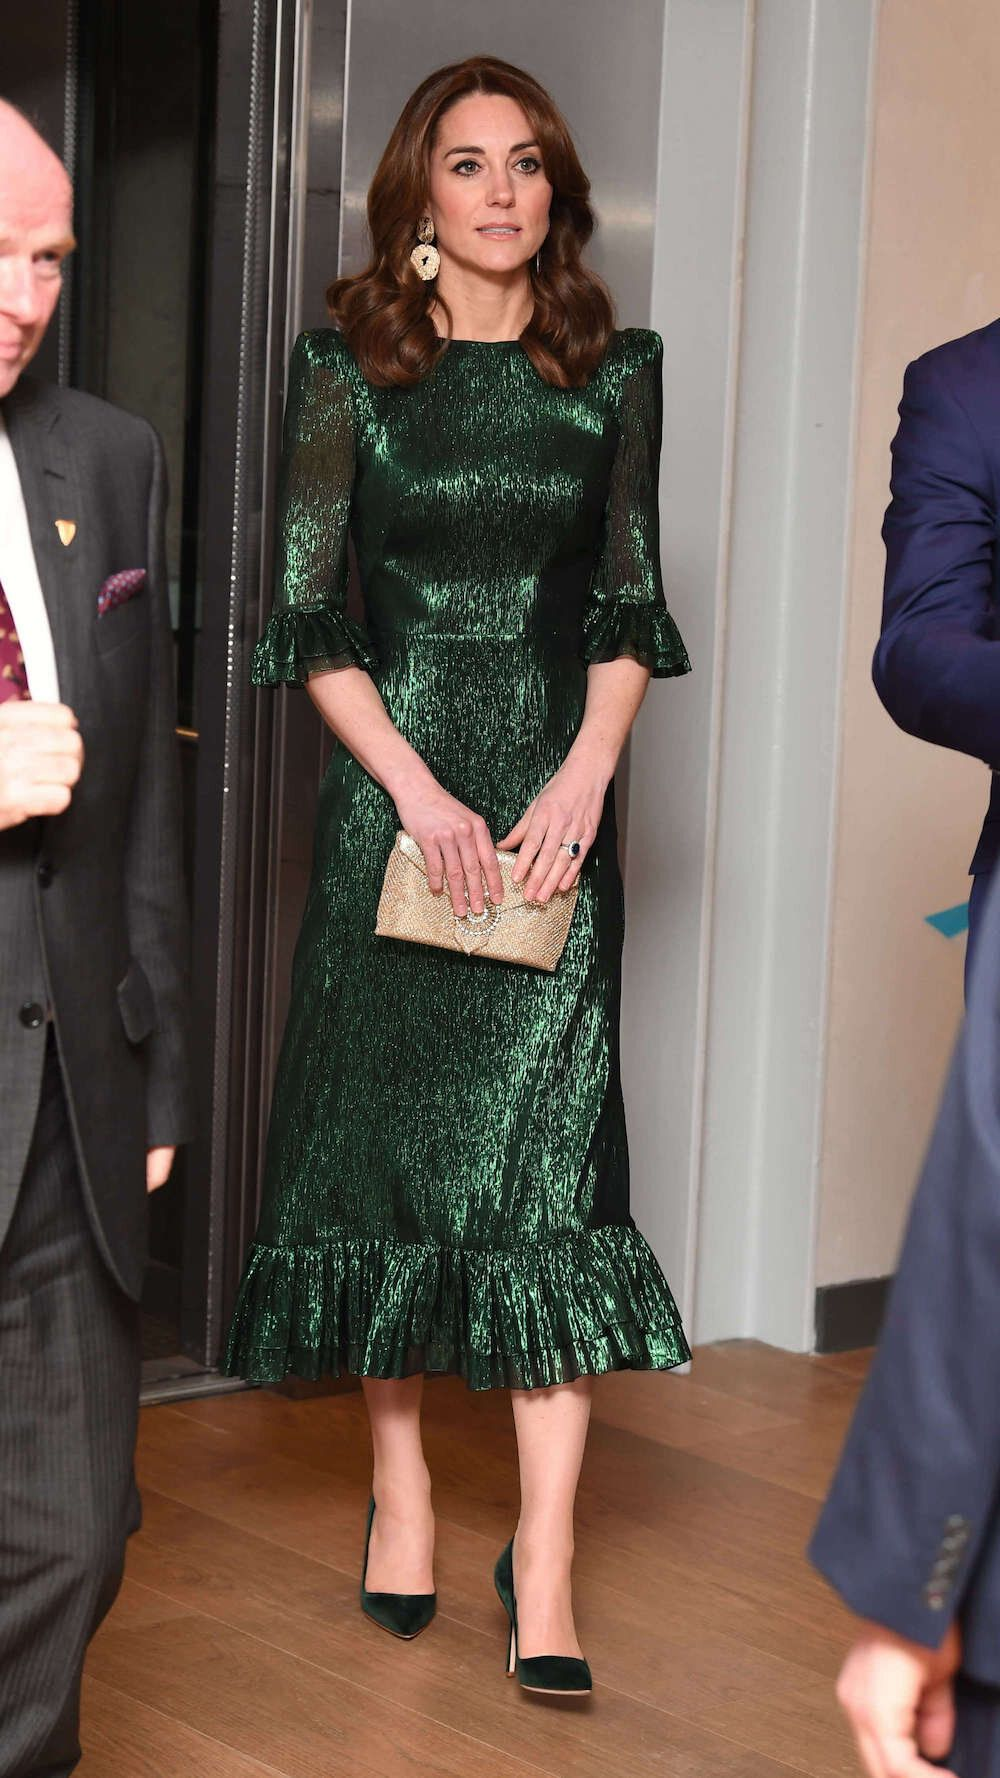 Grünes Kleid Kate Middleton  los angeles 2021